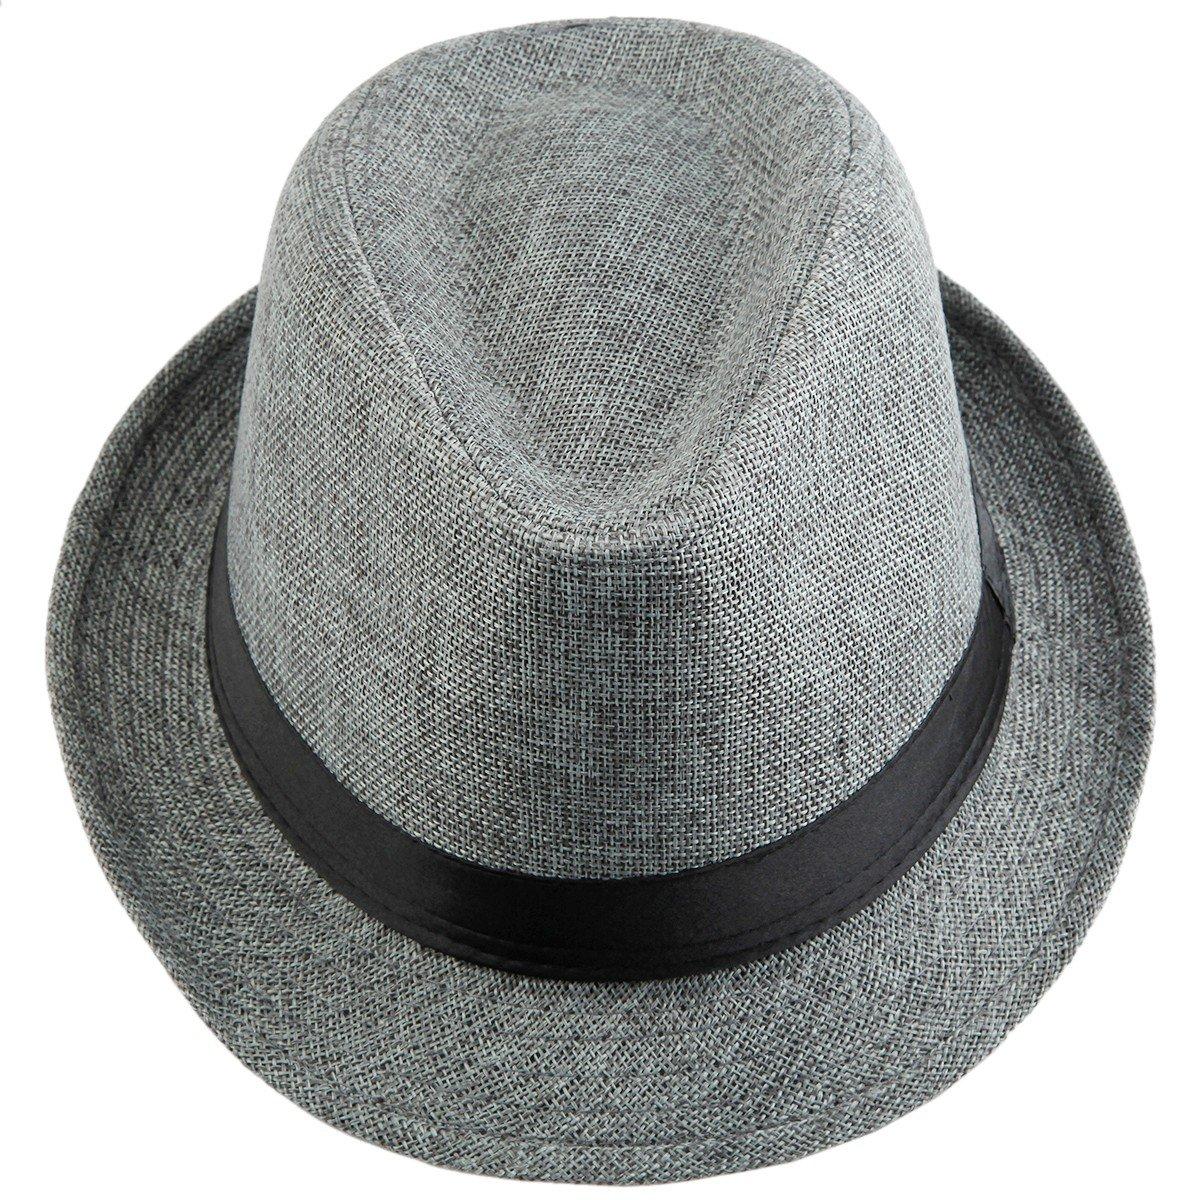 a2a52bbeecb58d Samtree Fedora Hats for Women Men,Braid Straw Short Brim Jazz Panama  Cap(01-Light Blue): Amazon.in: Clothing & Accessories